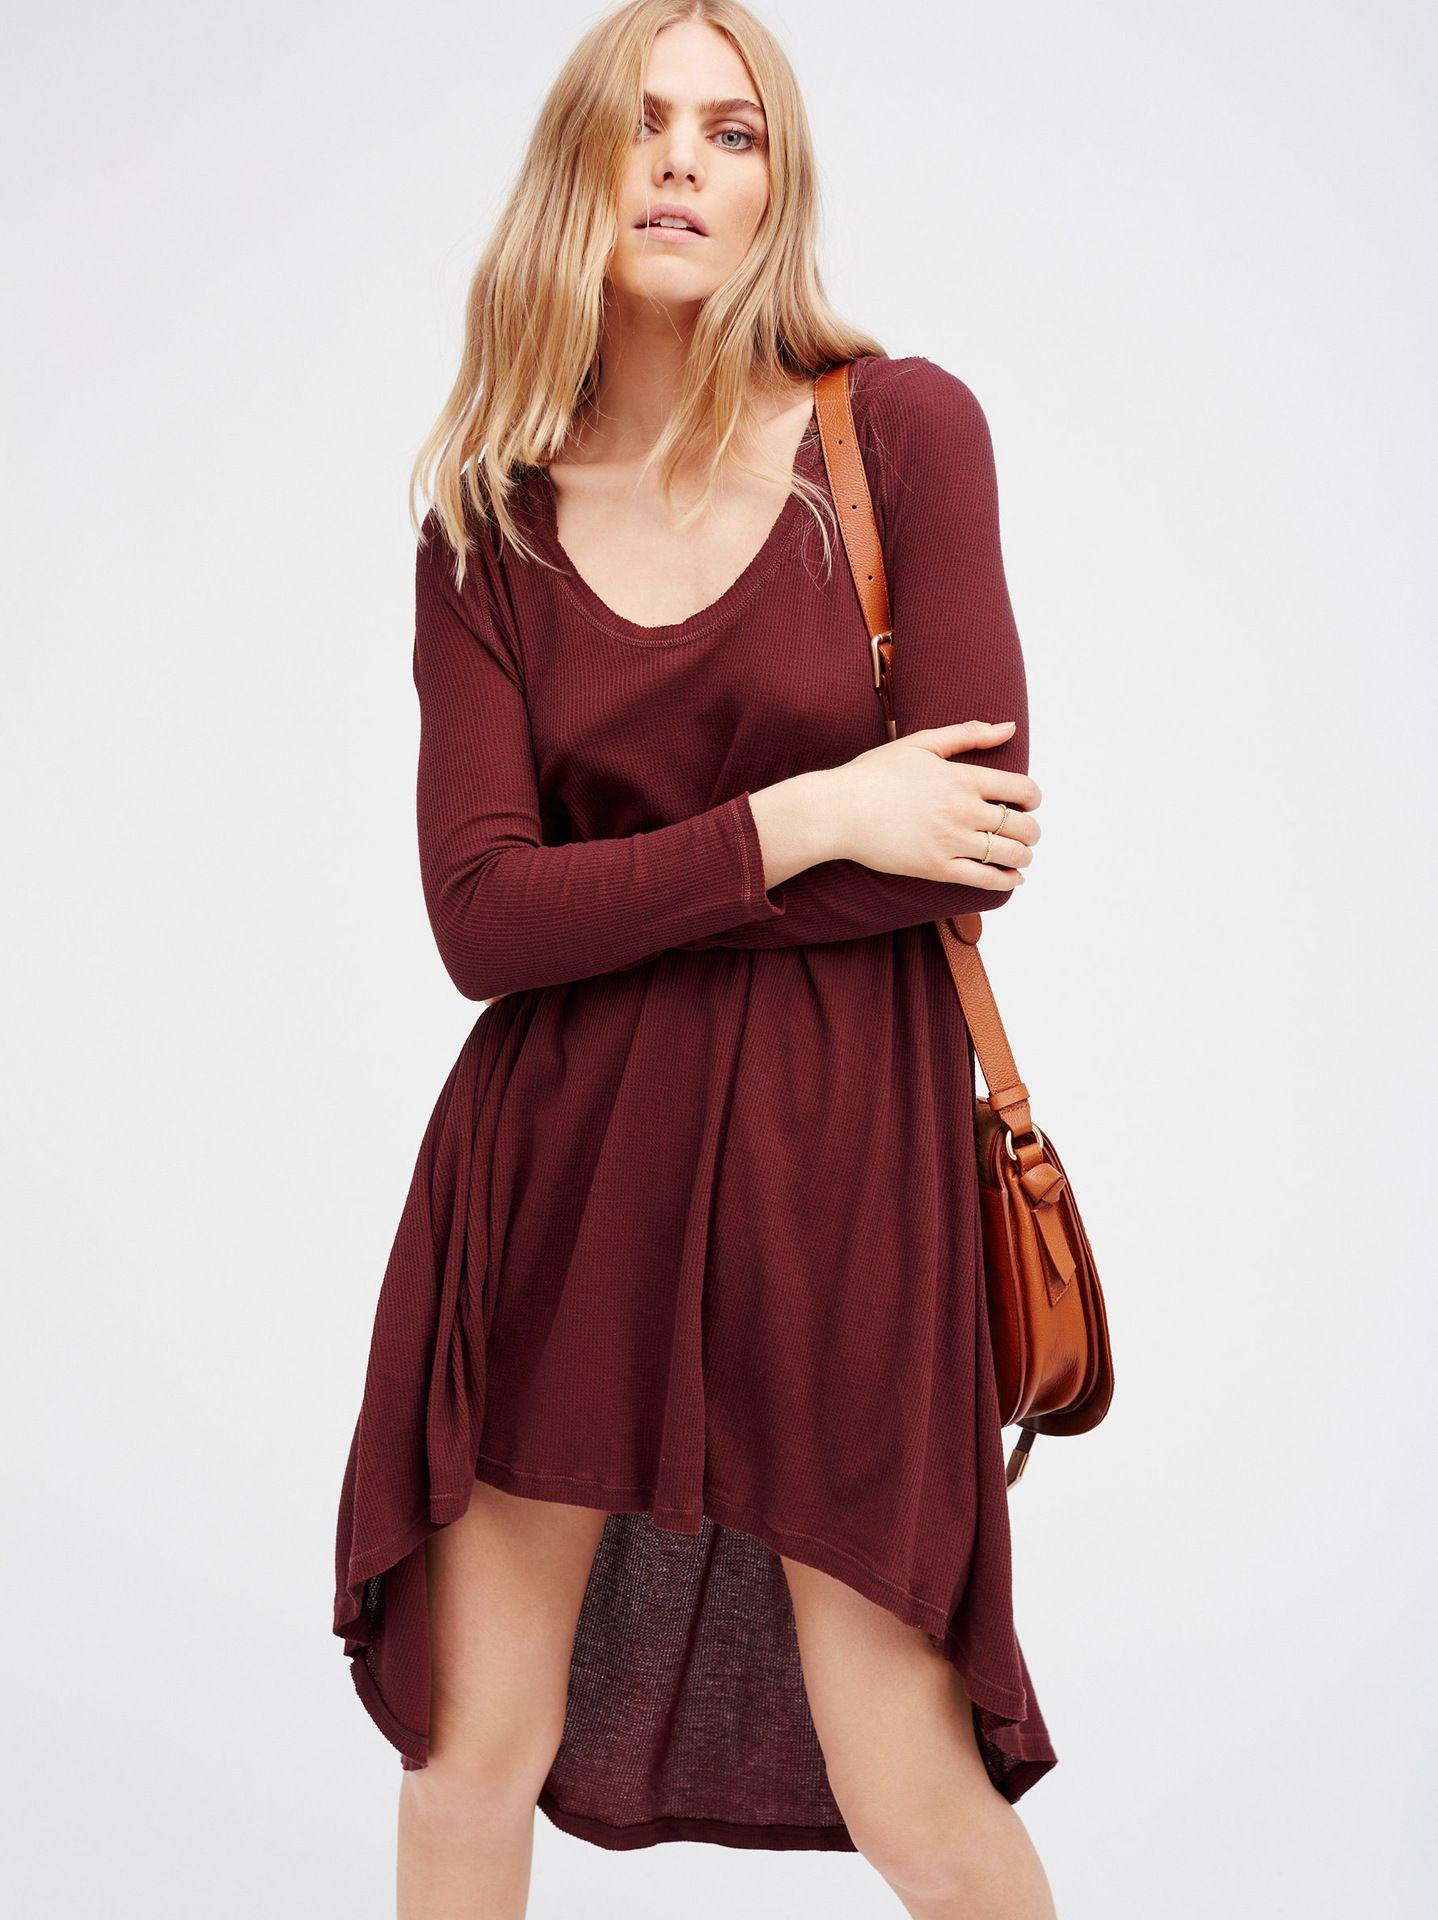 Click to buy ucuc womenus new knit cotton dress hooded fashion